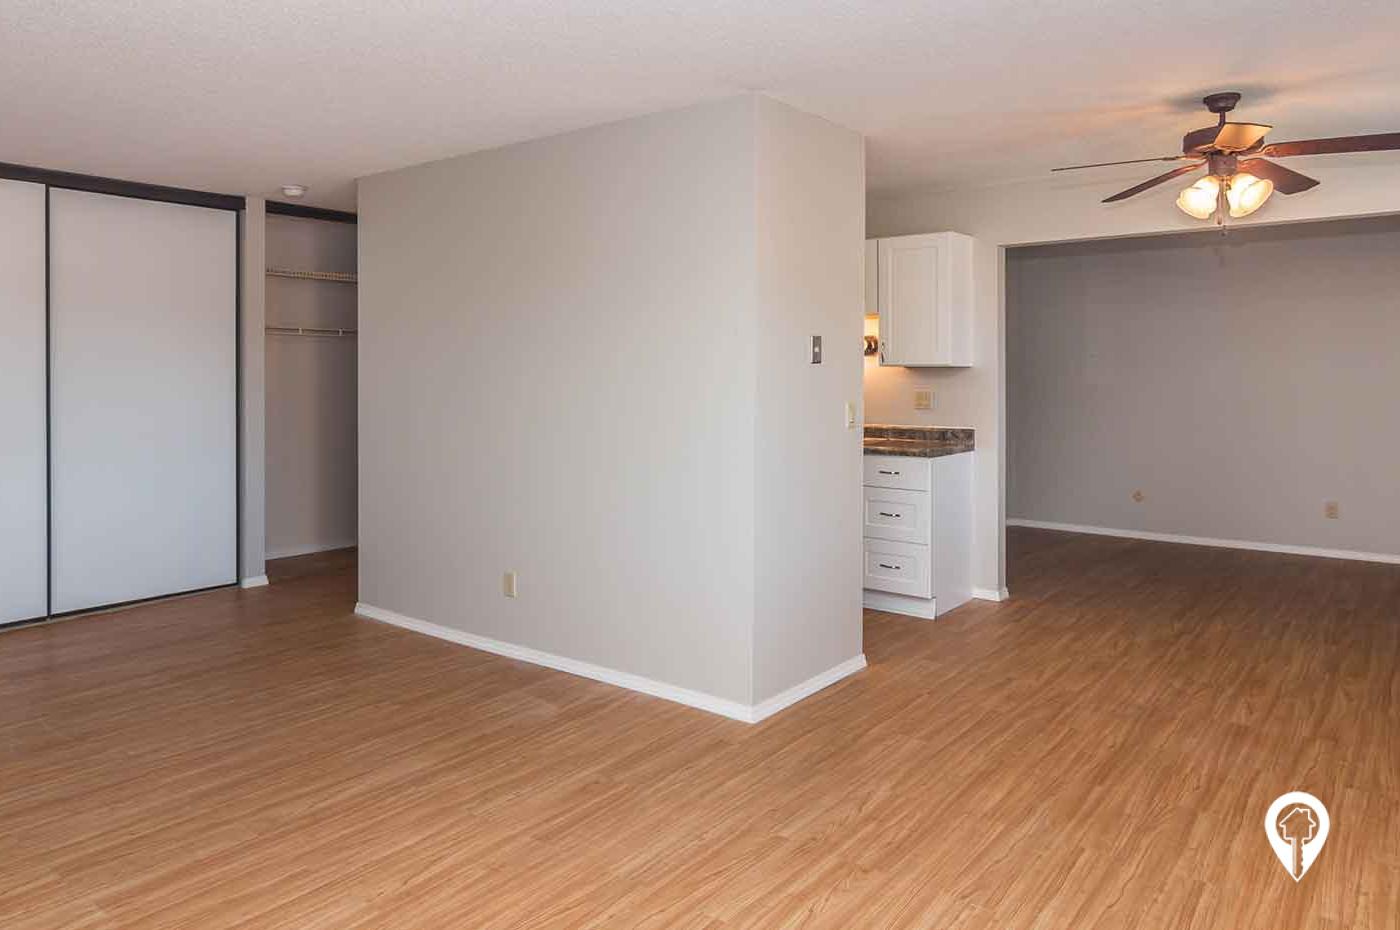 46West Apartments